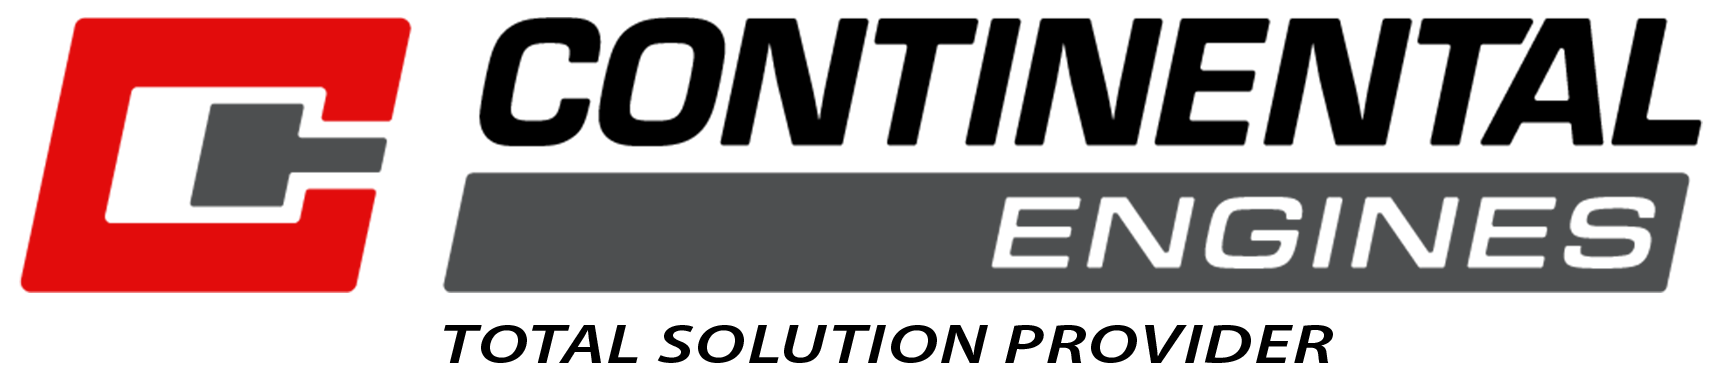 ROB20B-32636-H8